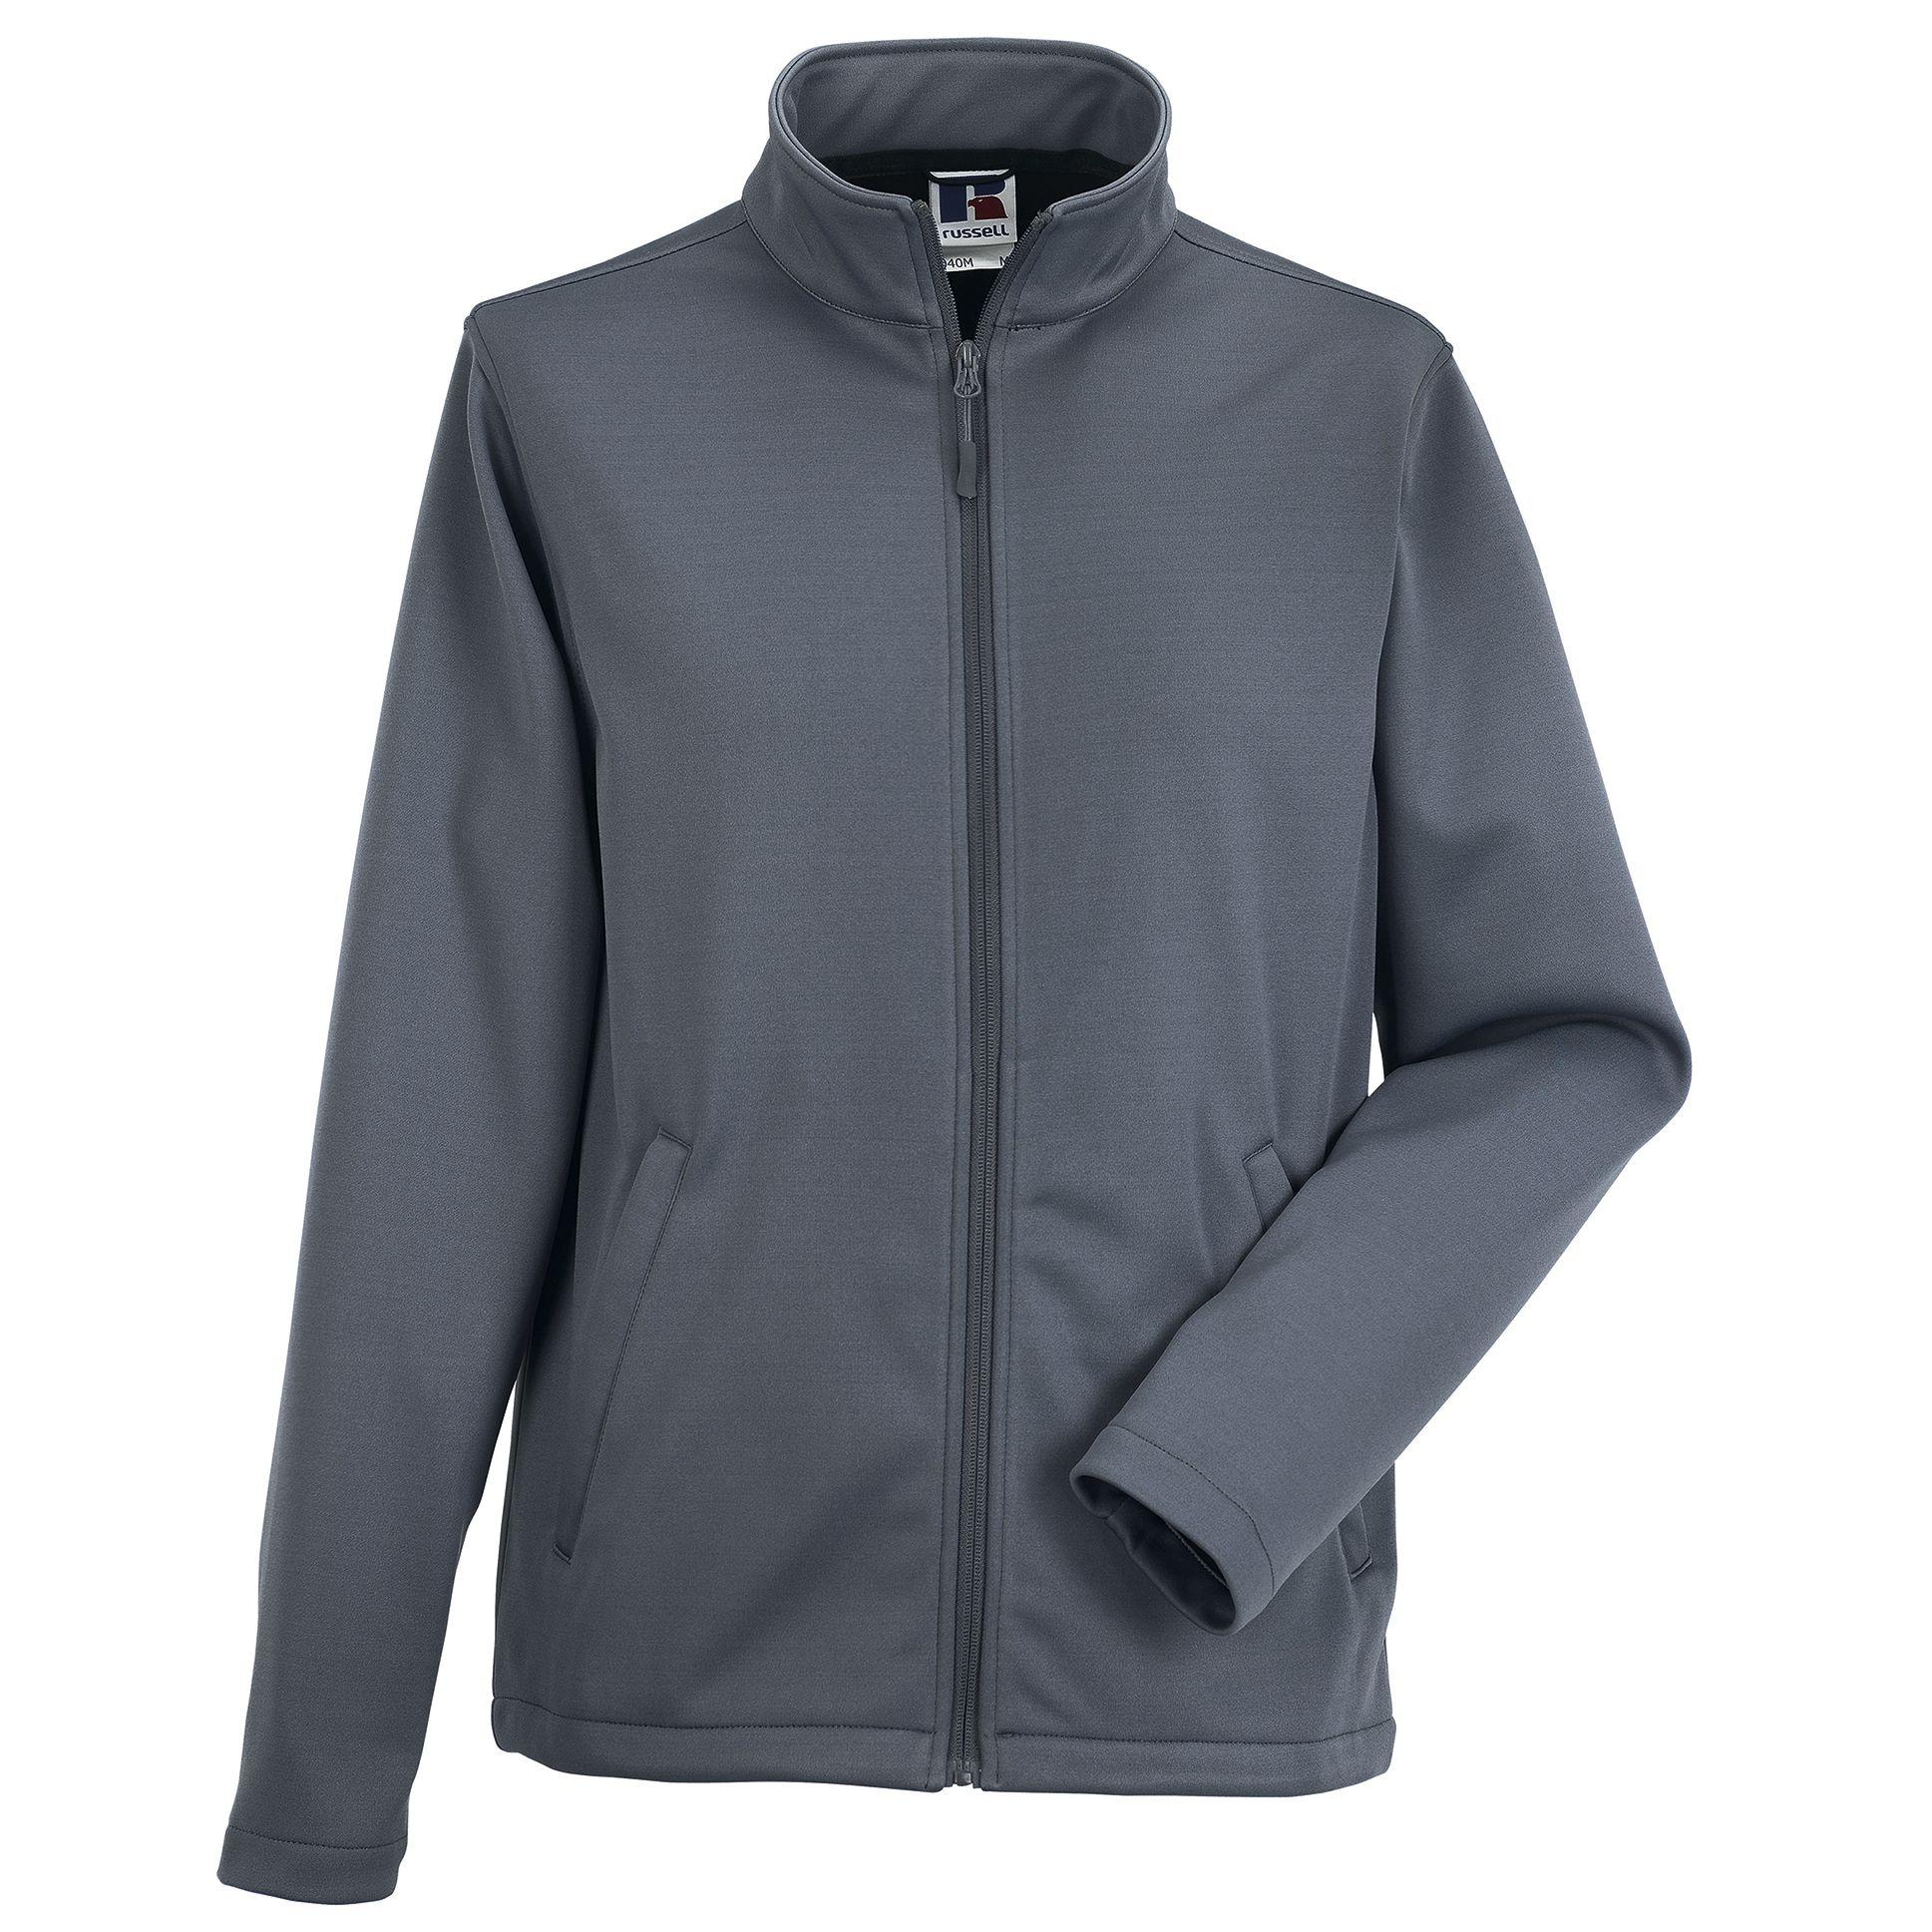 Russell Mens Smart Softshell Jacket (Convoy Grey)